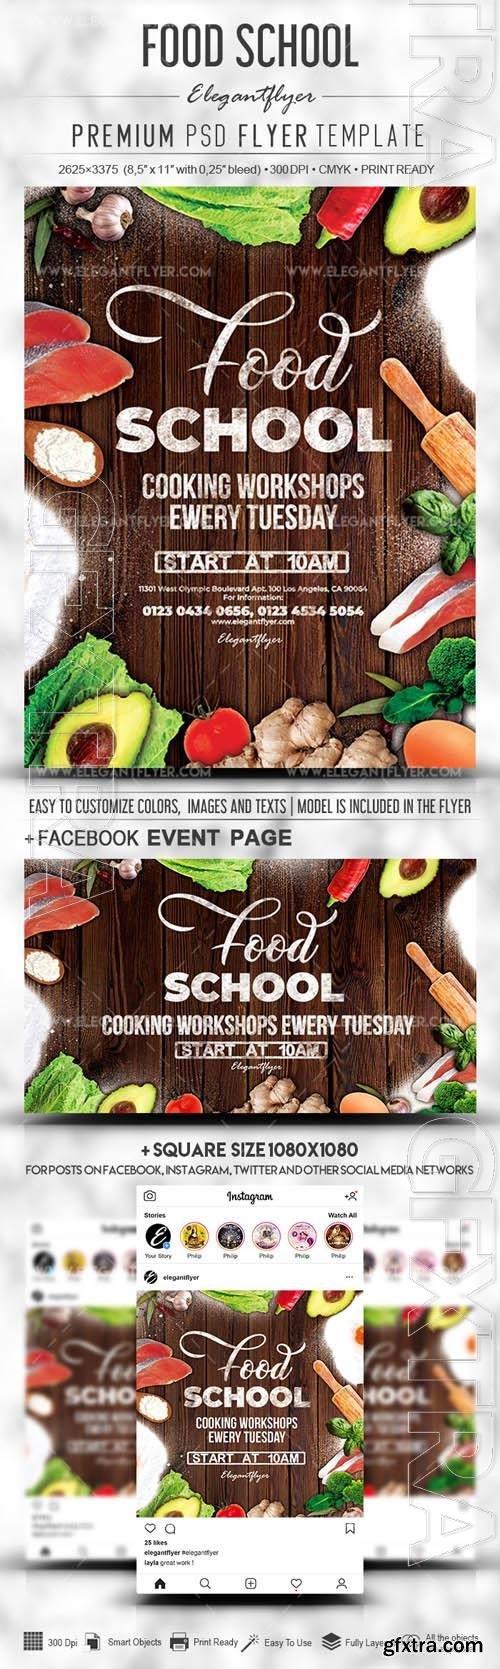 Food School PSD Flyer Template  Facebook Cover Instagram Post